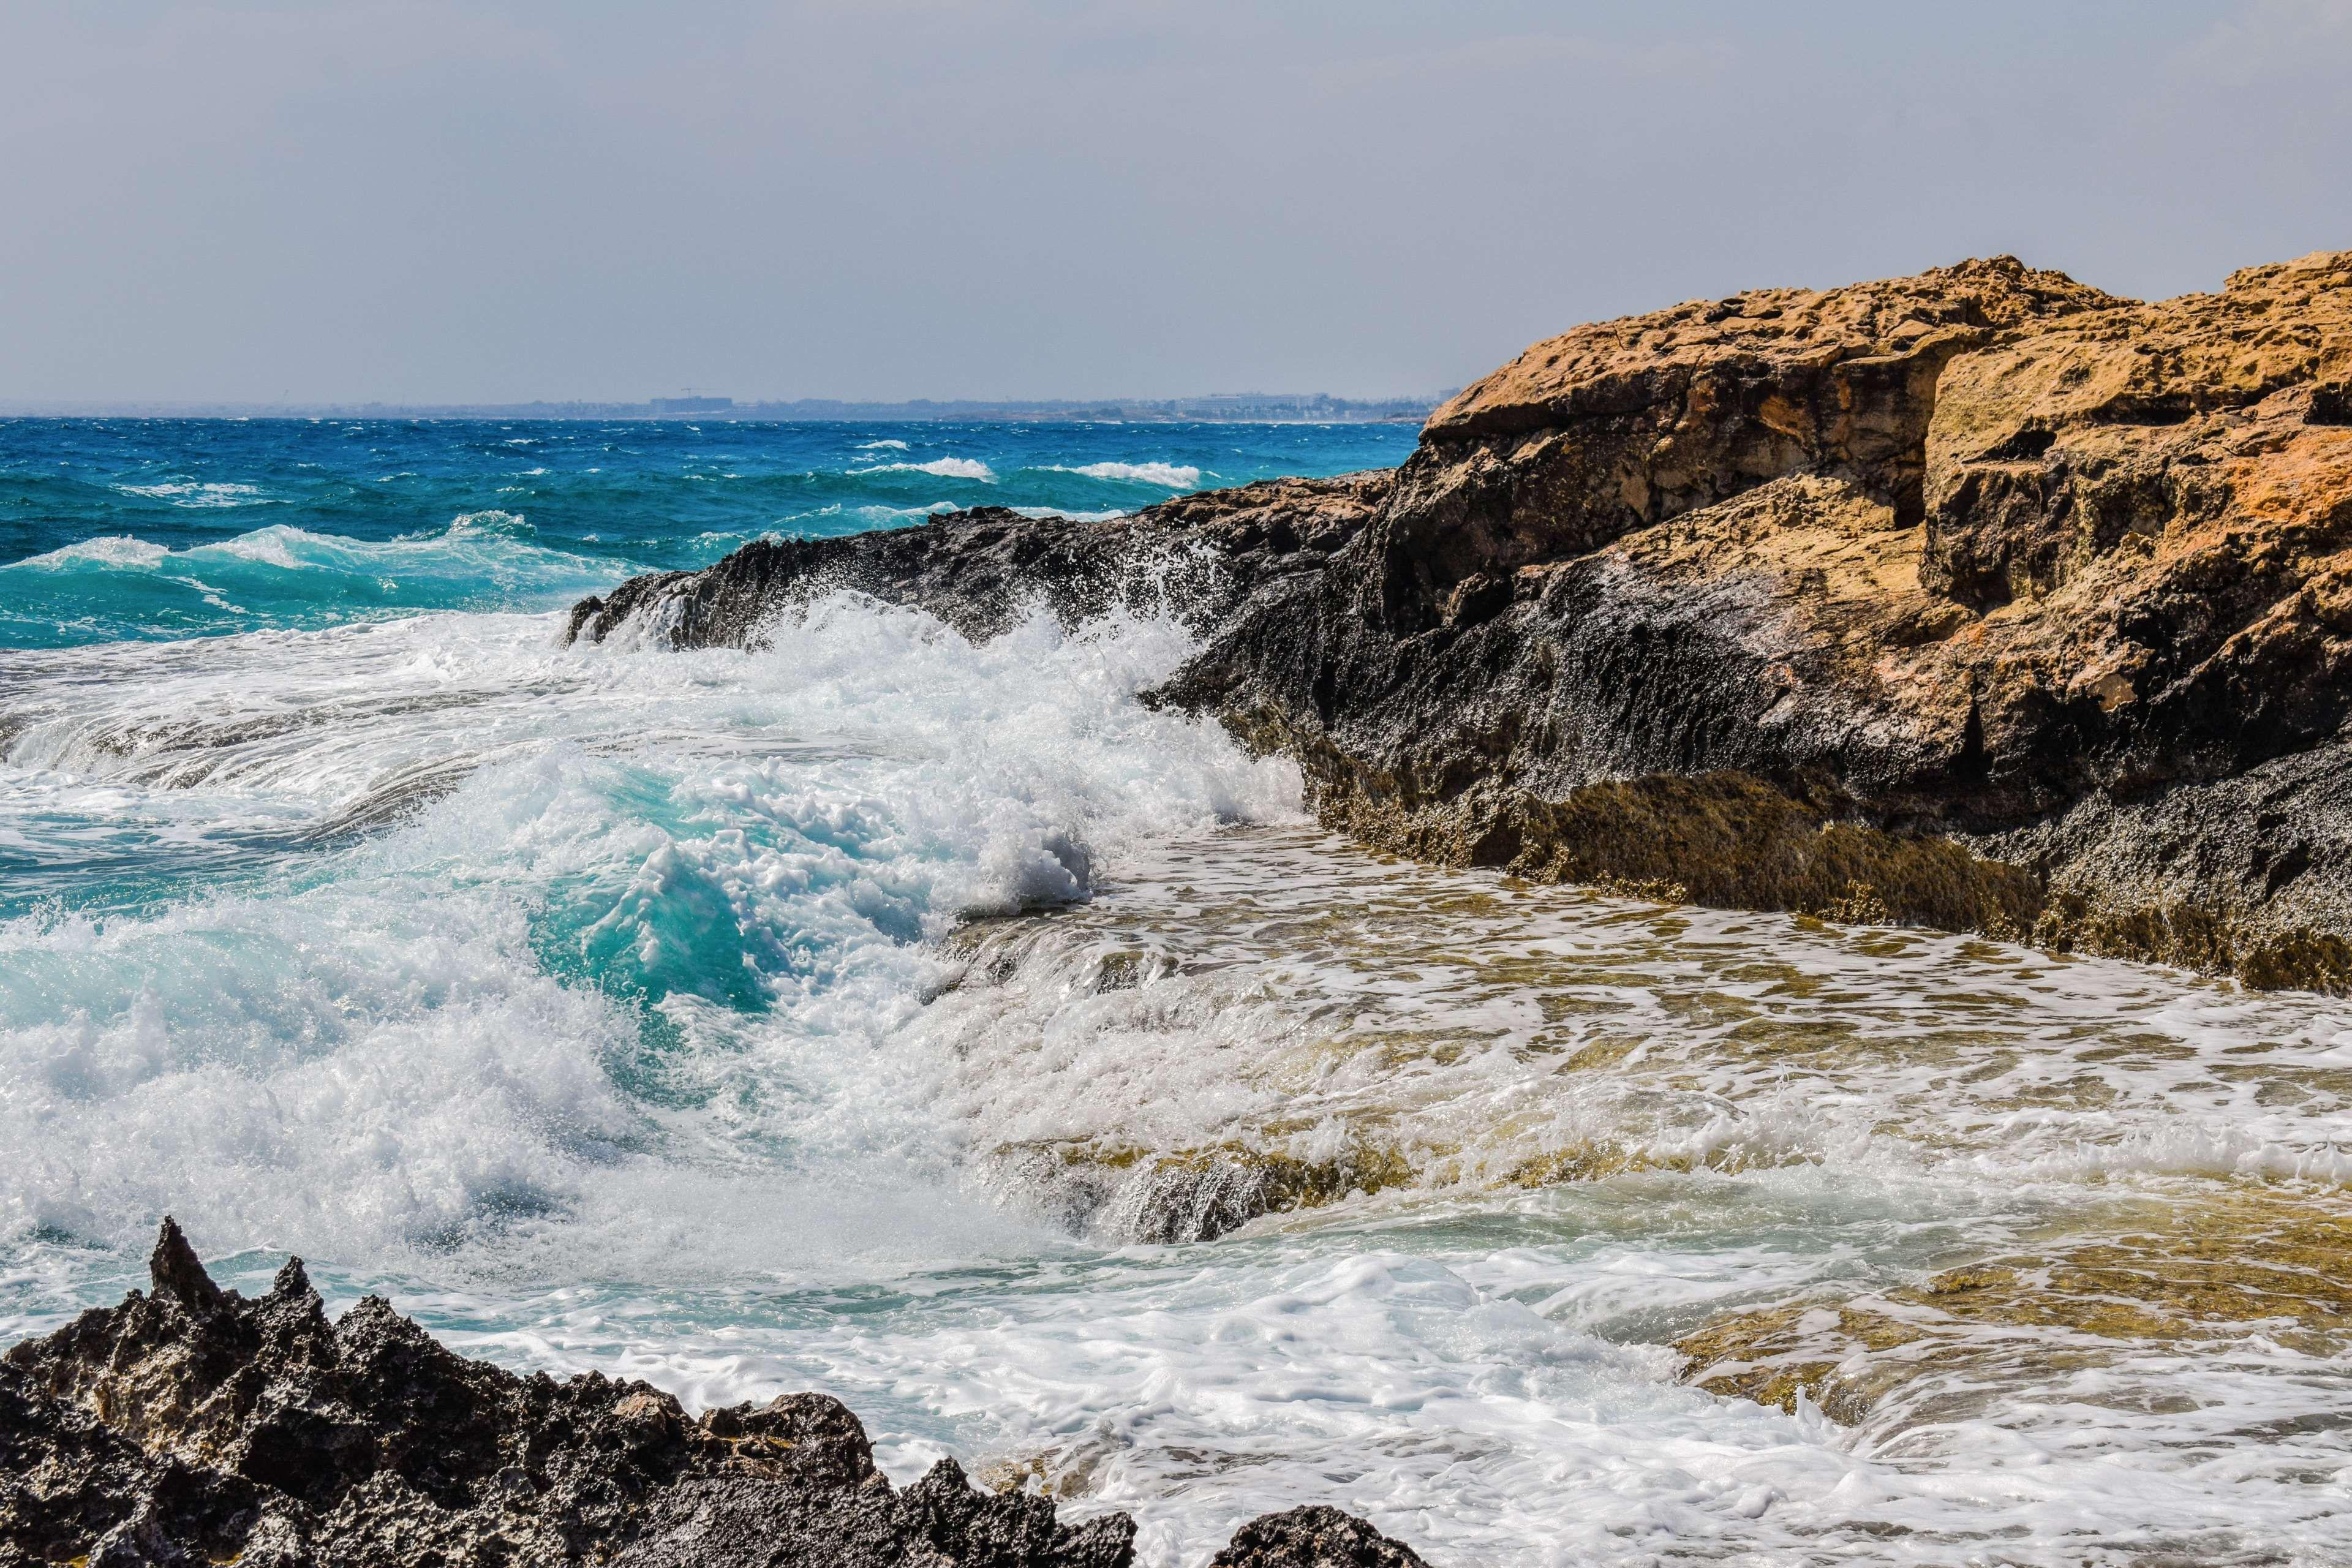 Coast Landscape Nature Ocean Outdoors Rocks Rocky Scenery Scenic Sea Seascape Seashore Shore Sky Sp Landscape Wyoming Landscape Scenery Pictures